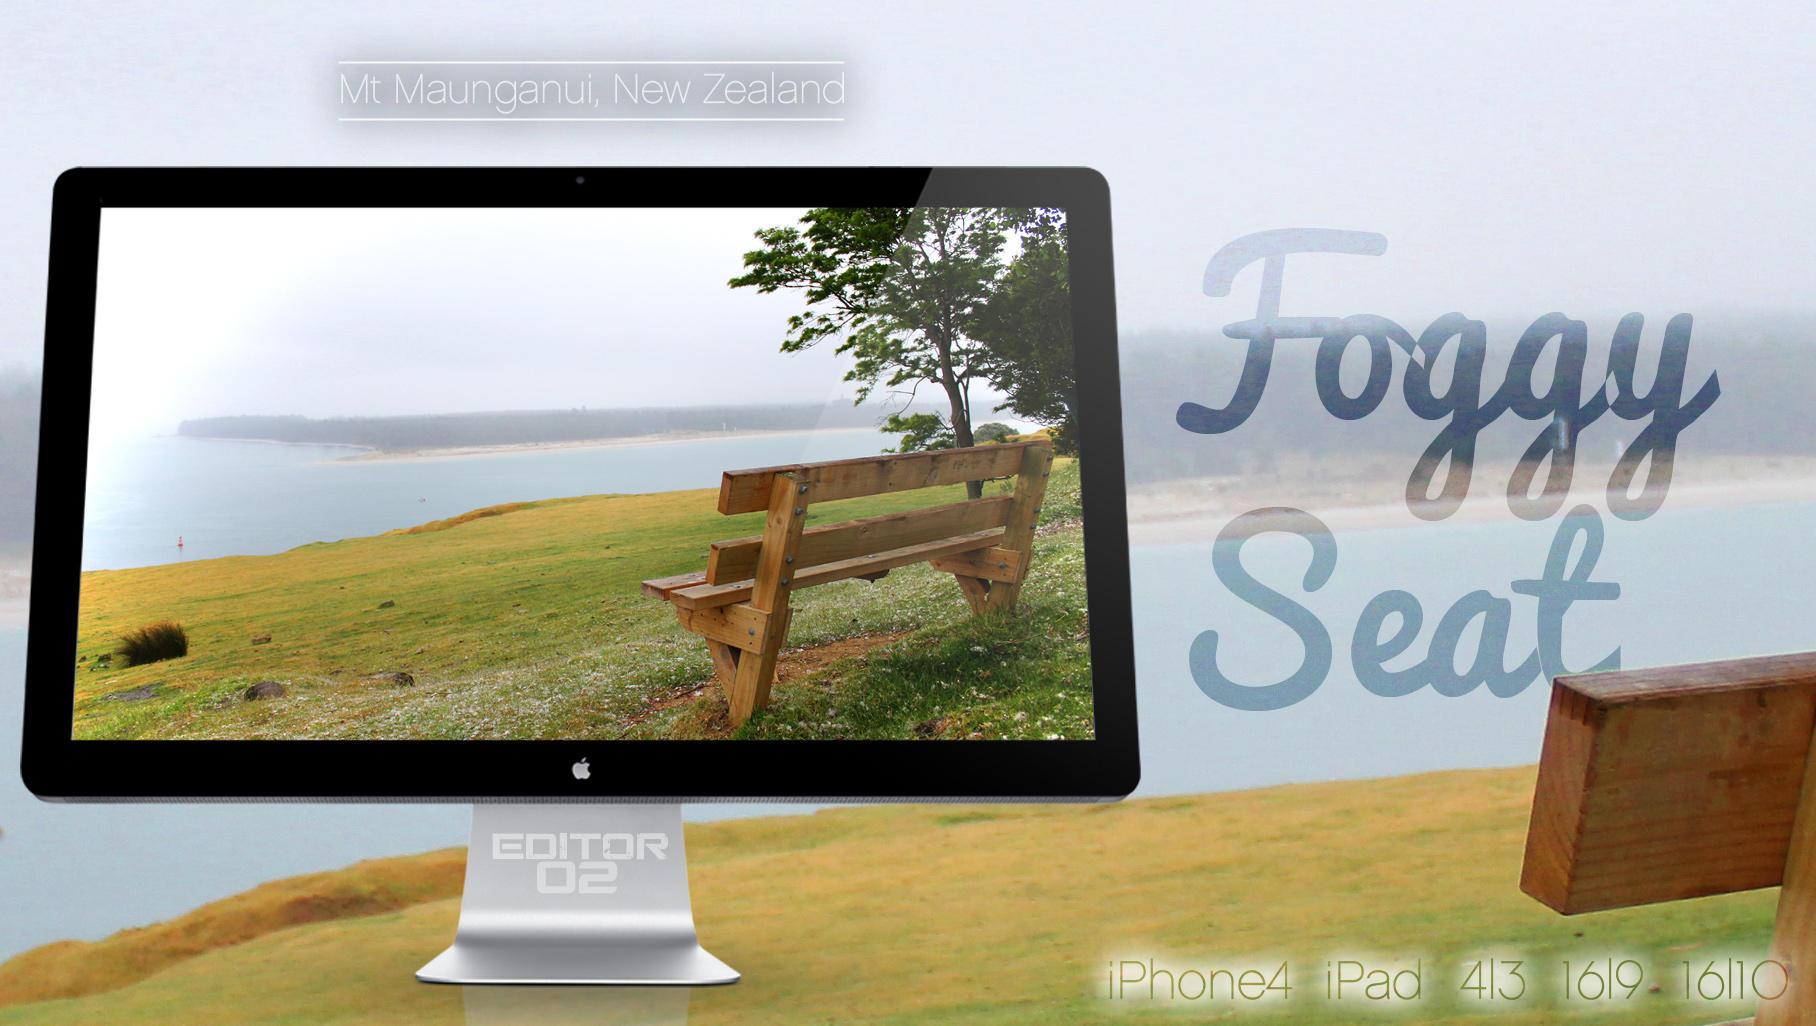 Foggy Seat - Wallpaper by GavinAsh